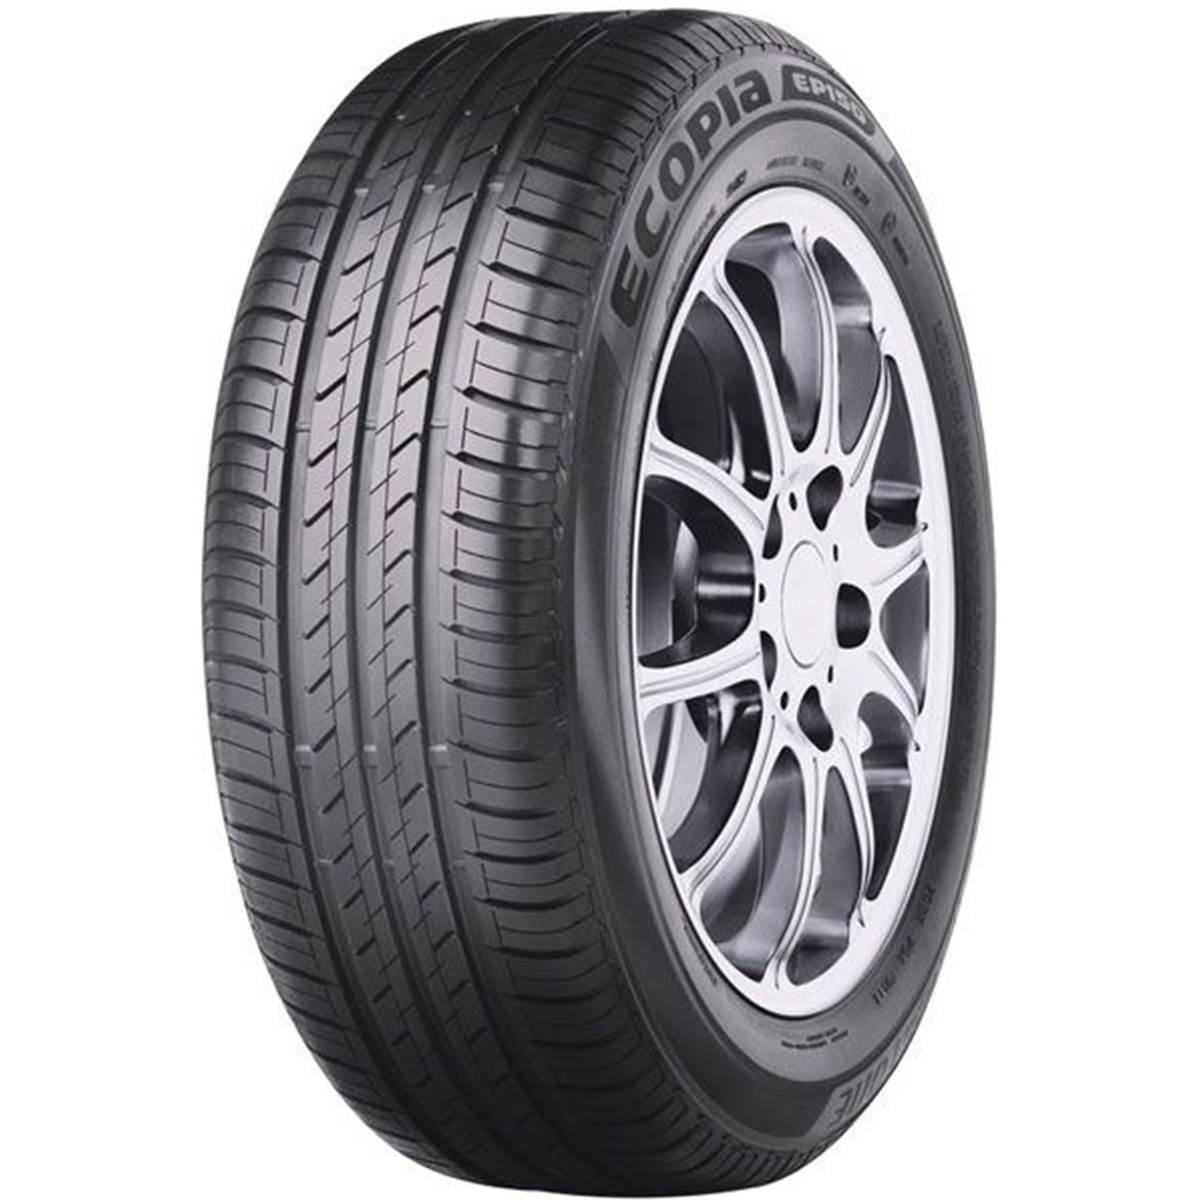 Pneu Bridgestone 205/60R16 92H Ecopia Ep150